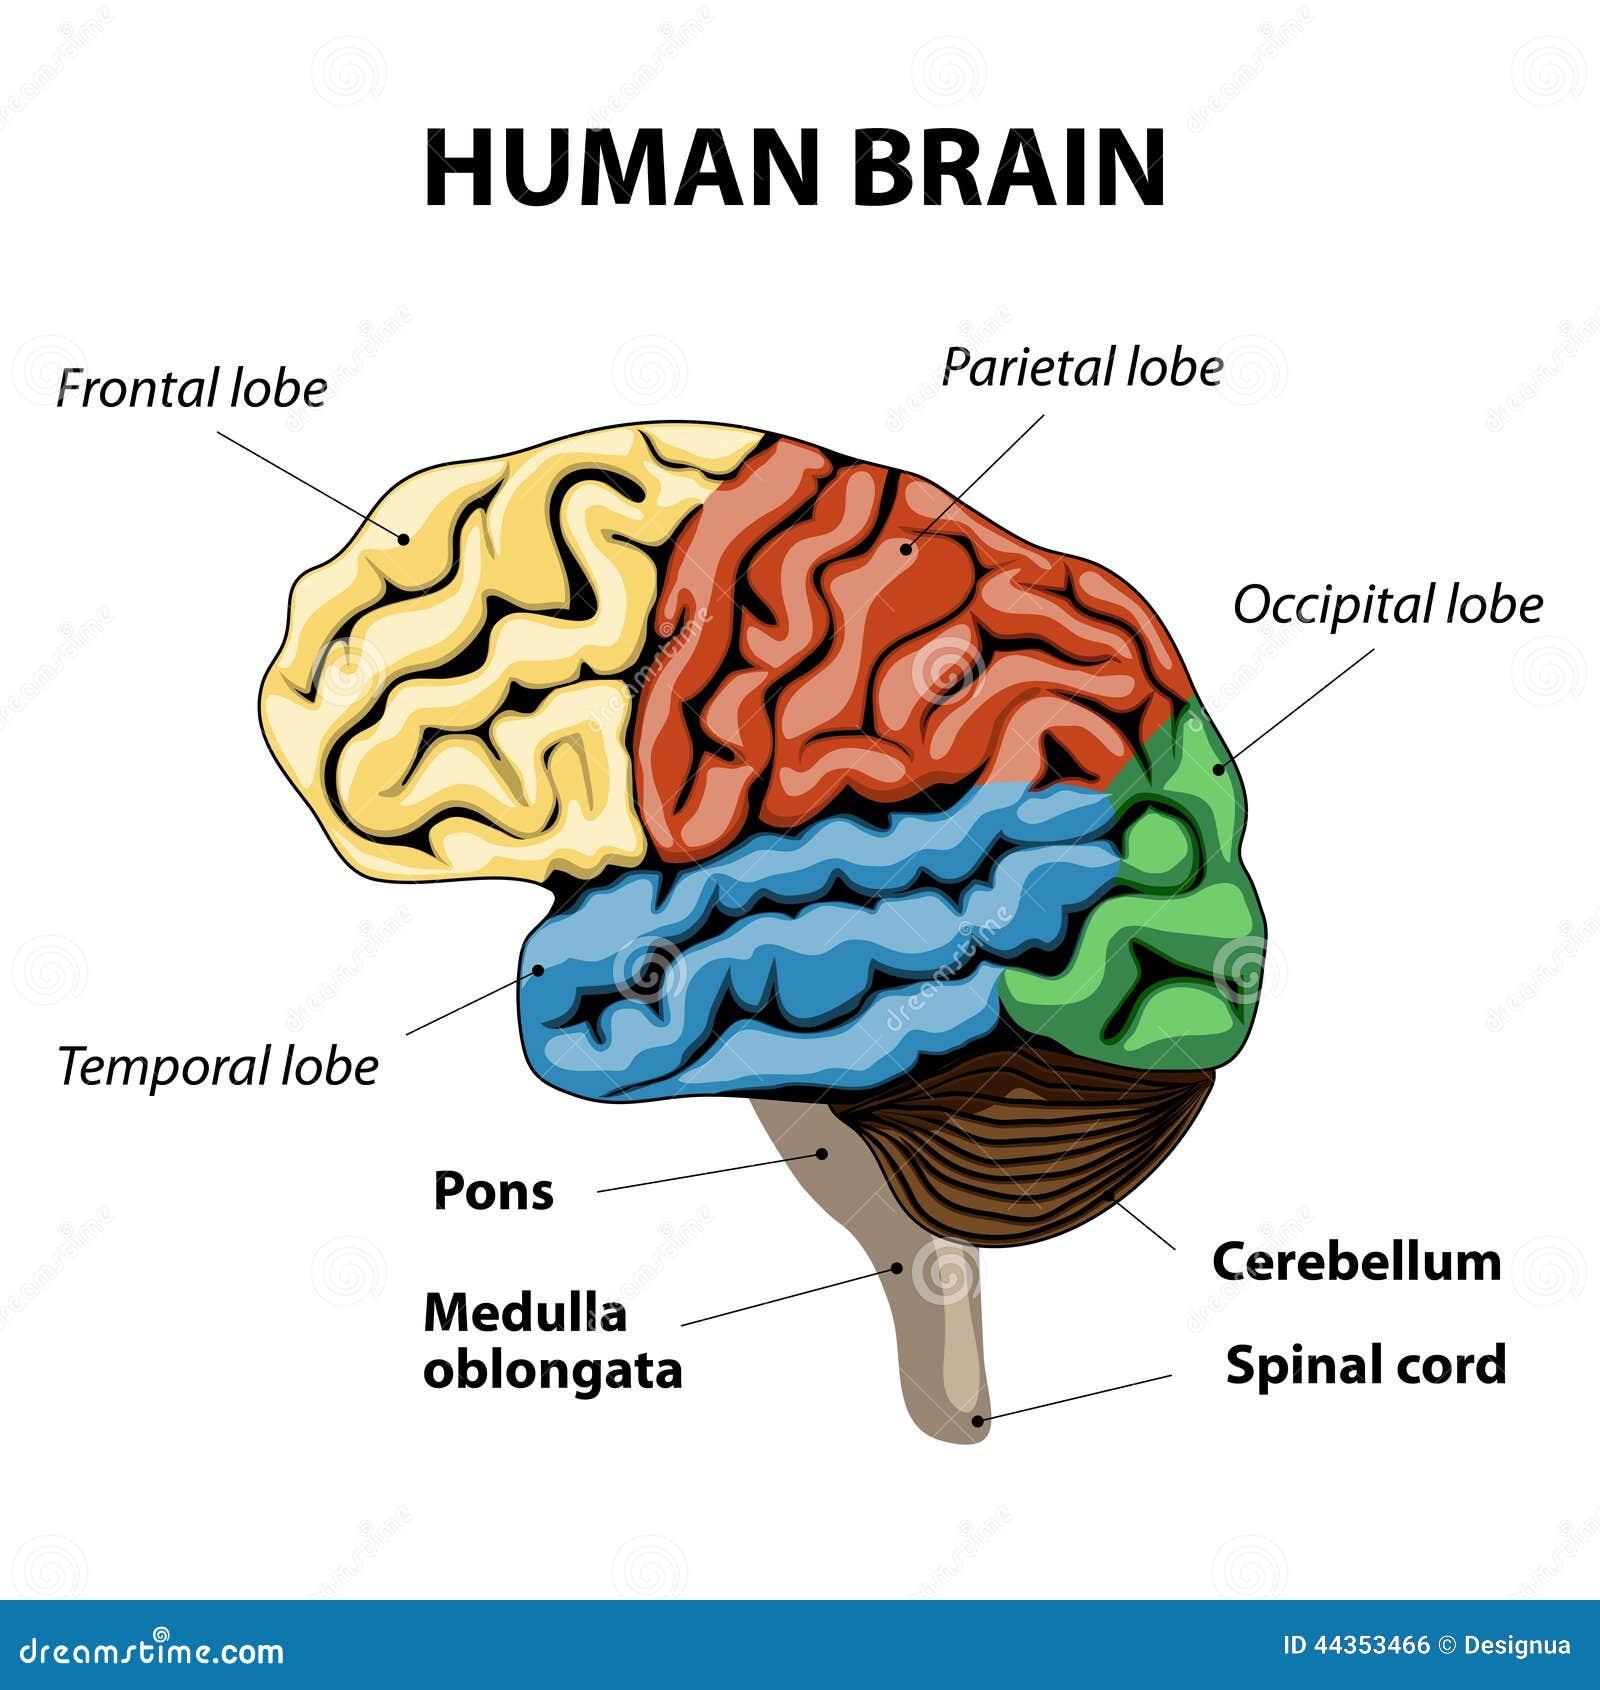 Human Brain Anatomy 3d Human Brain Anatomy Images